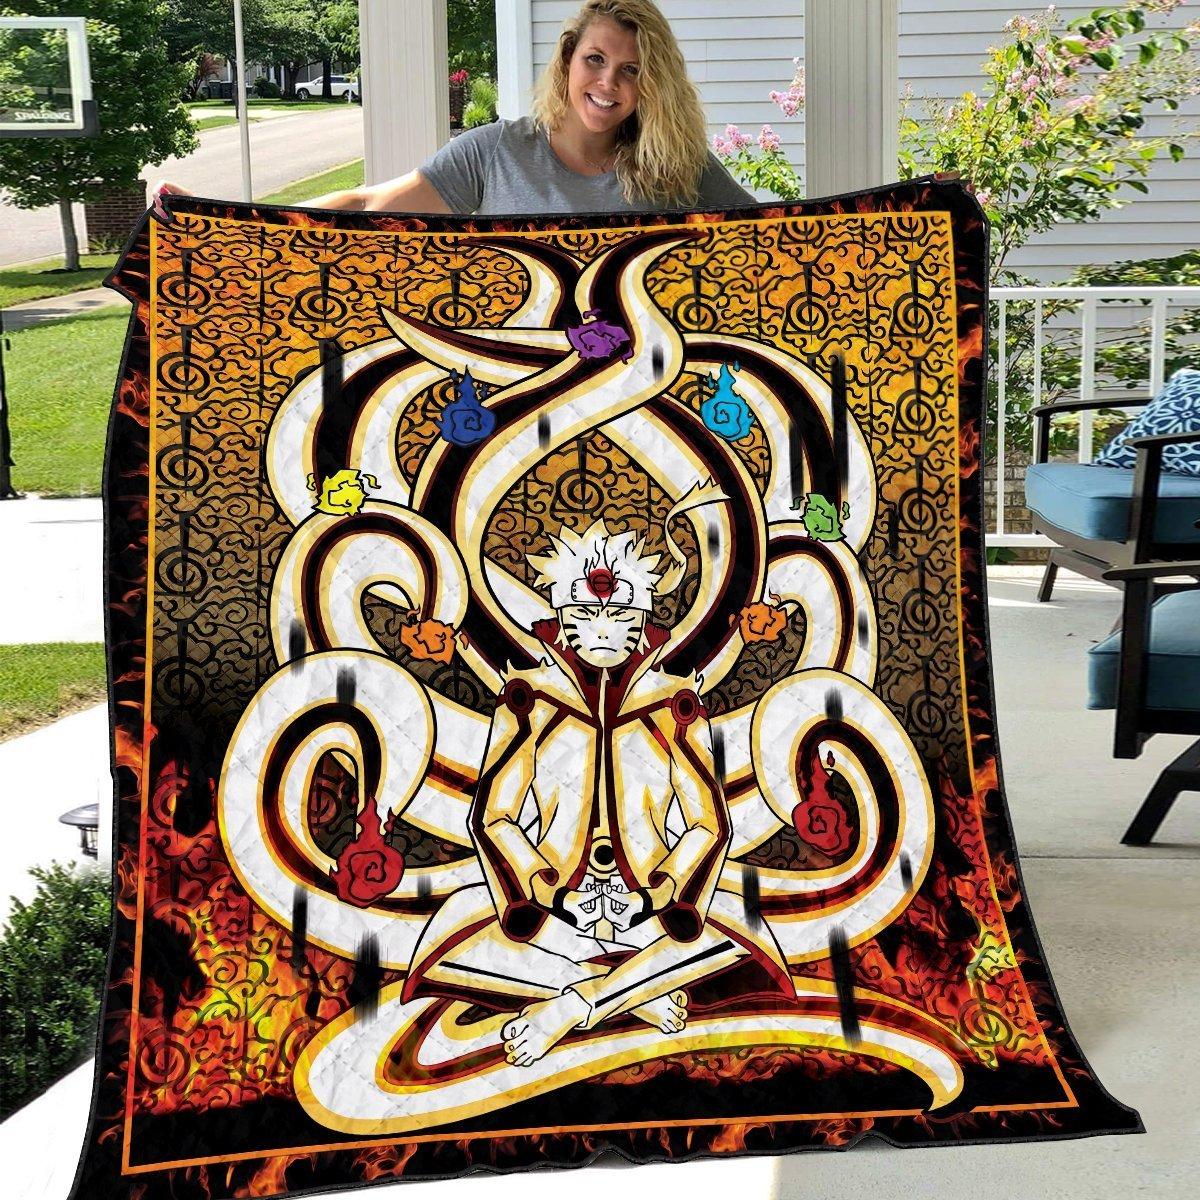 nine tails chakra mode quilt blanket 463748 - Otaku Treat